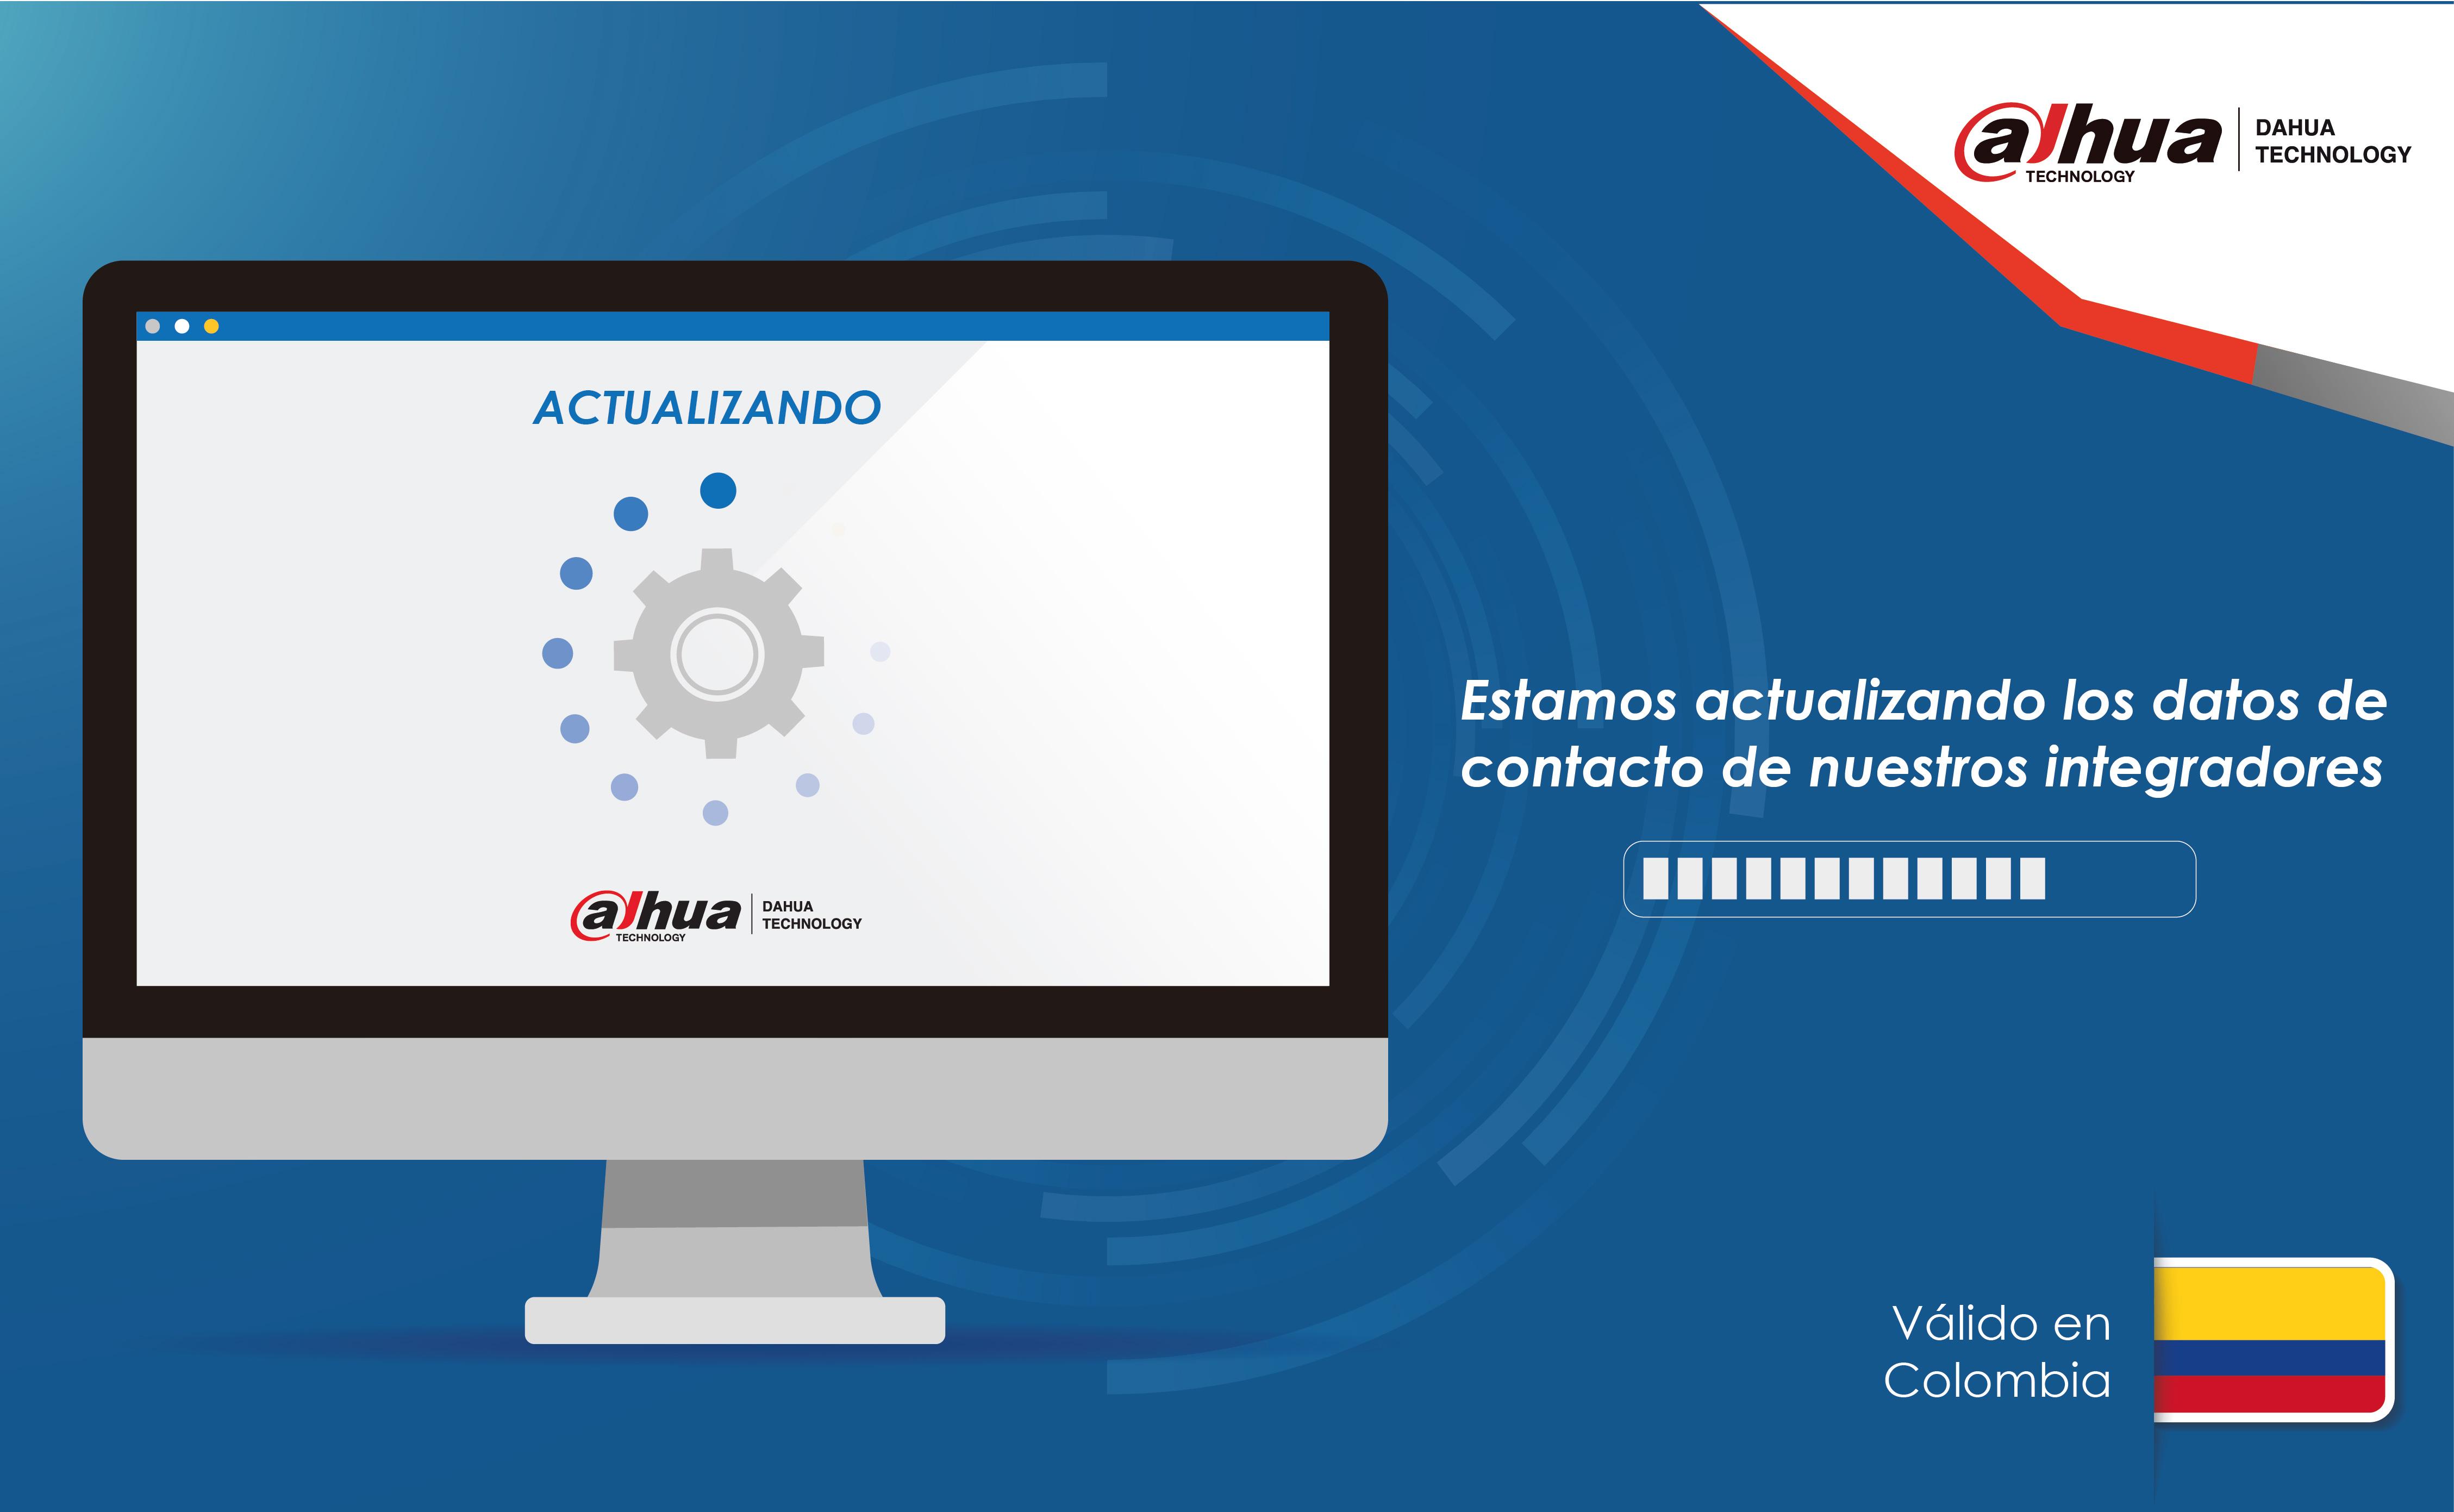 Actualización de datos Dahua en Colombia